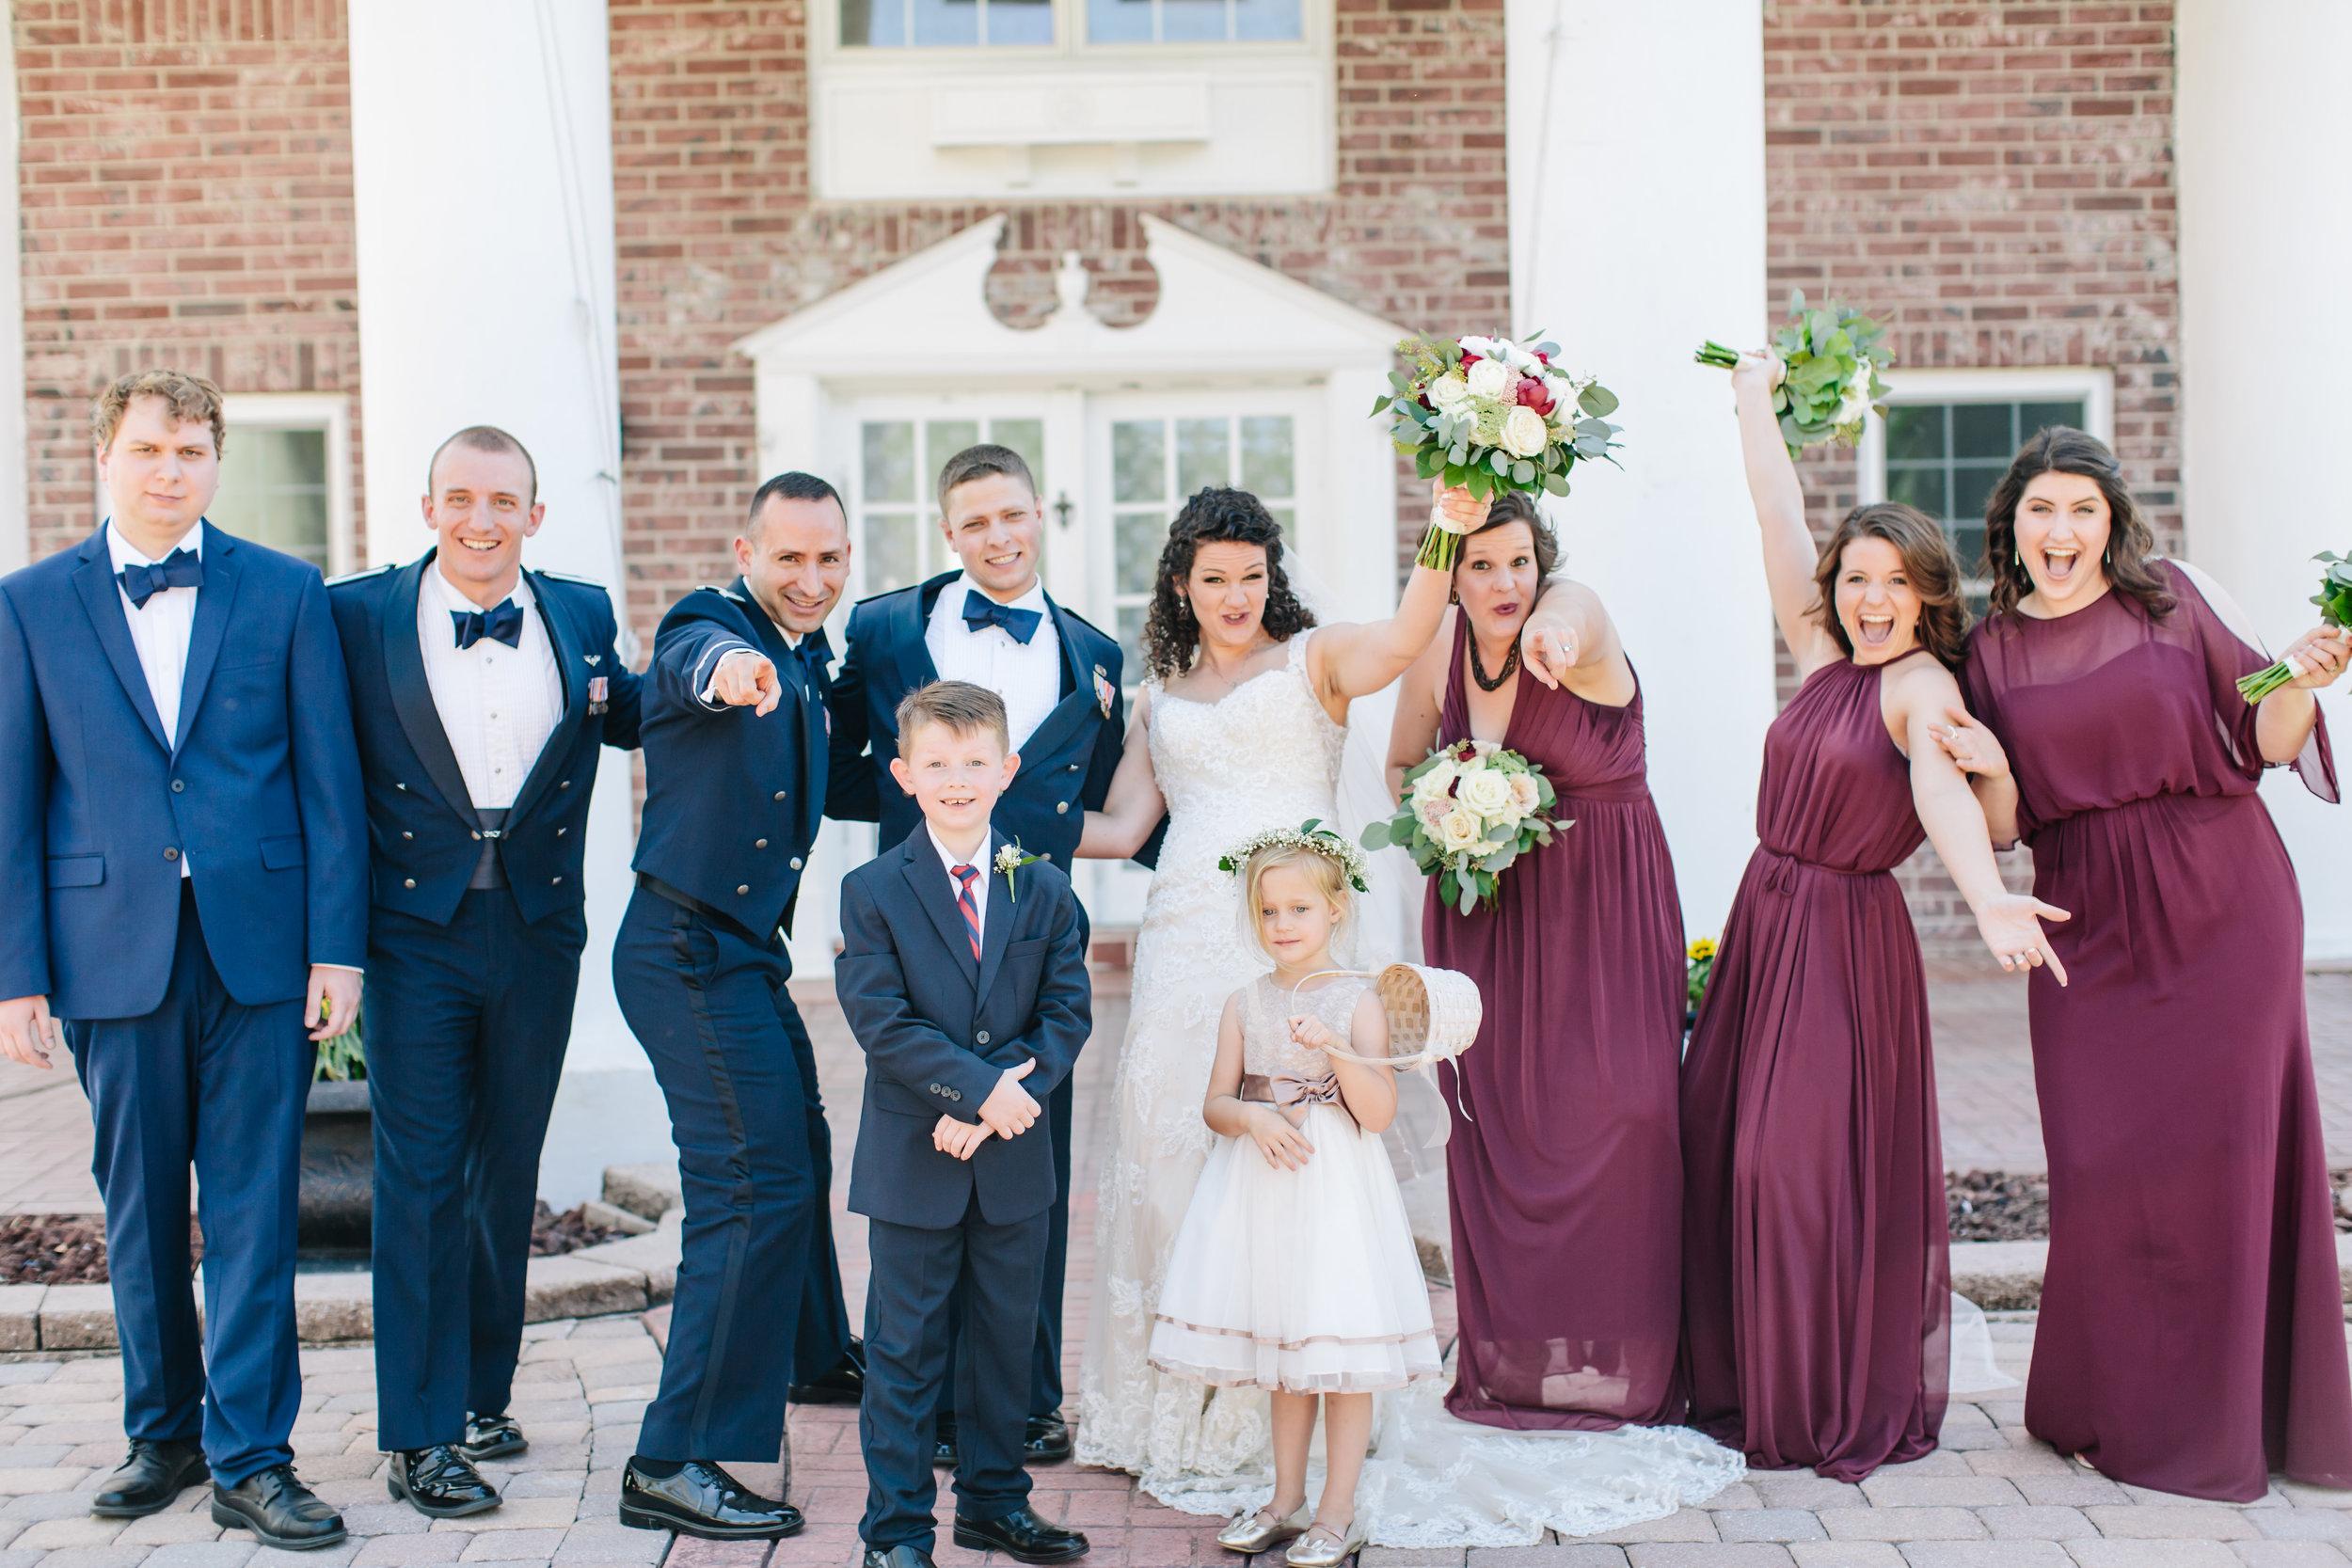 2018.03.17 Allison and Chuck Wedding Waelti Melbourne (386 of 569).jpg